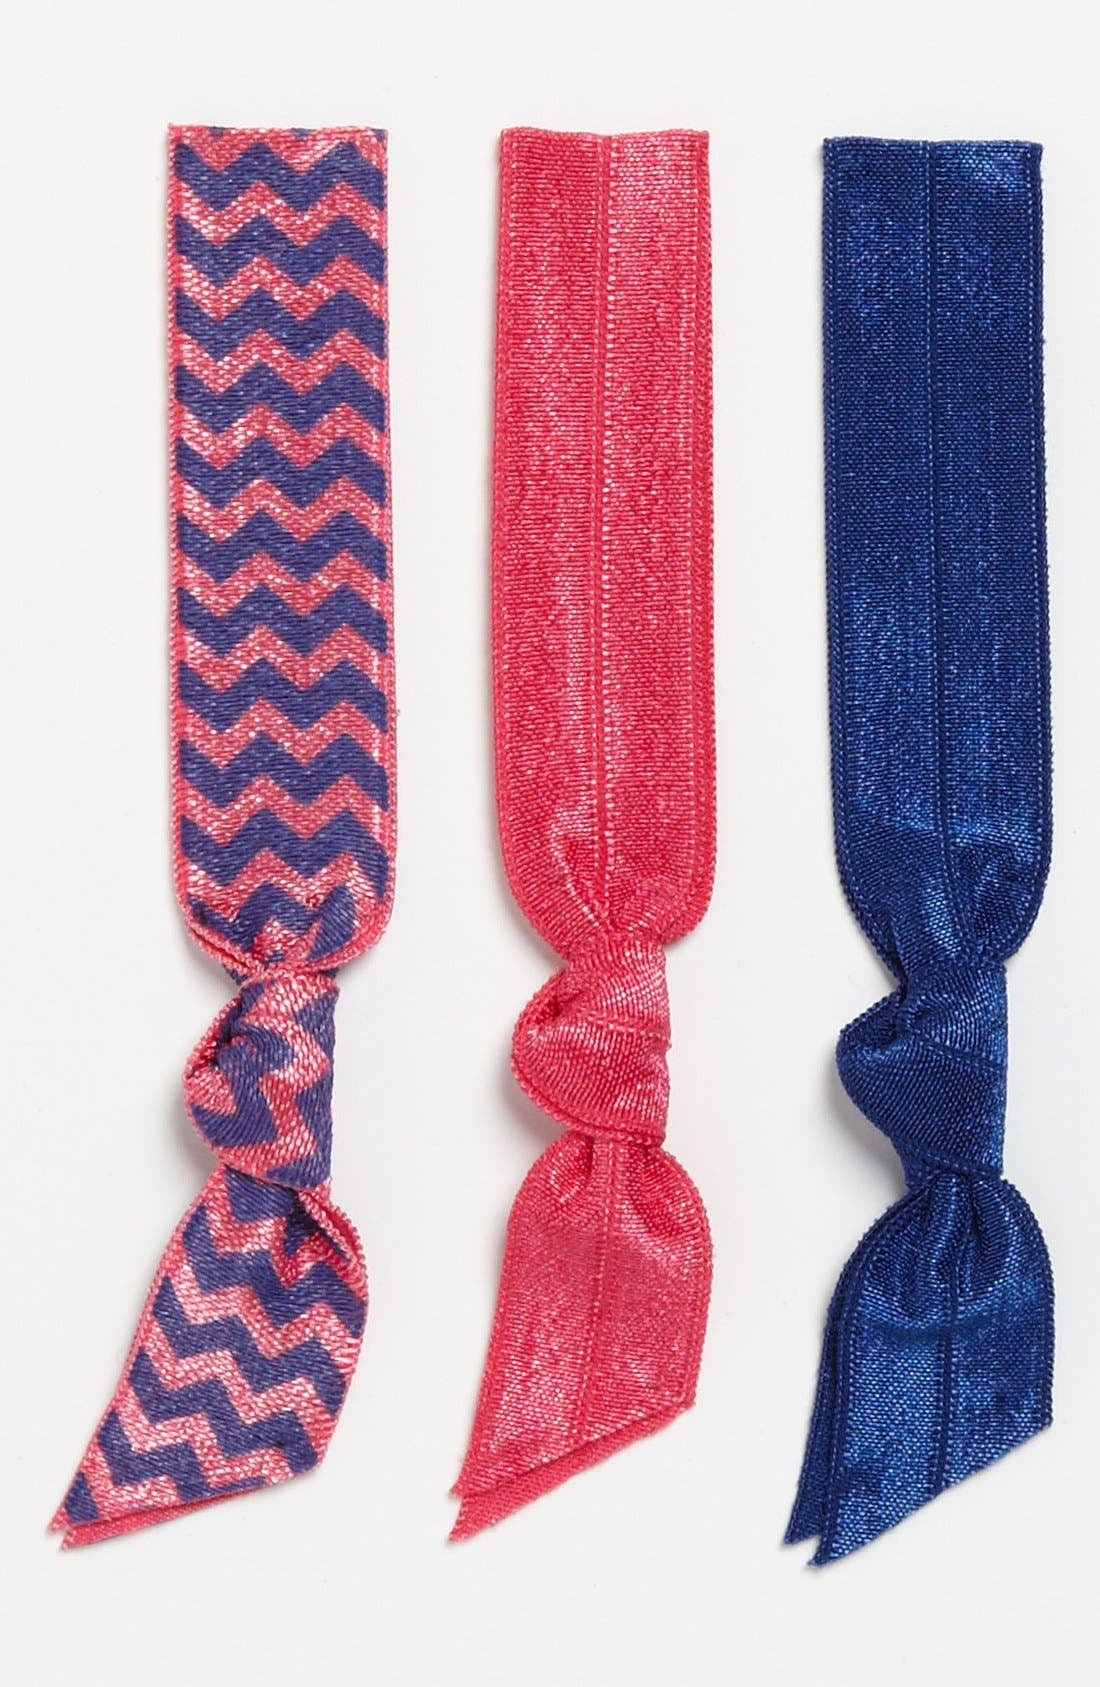 Main Image - Emi-Jay 'Chevron' Hair Ties (3-Pack)